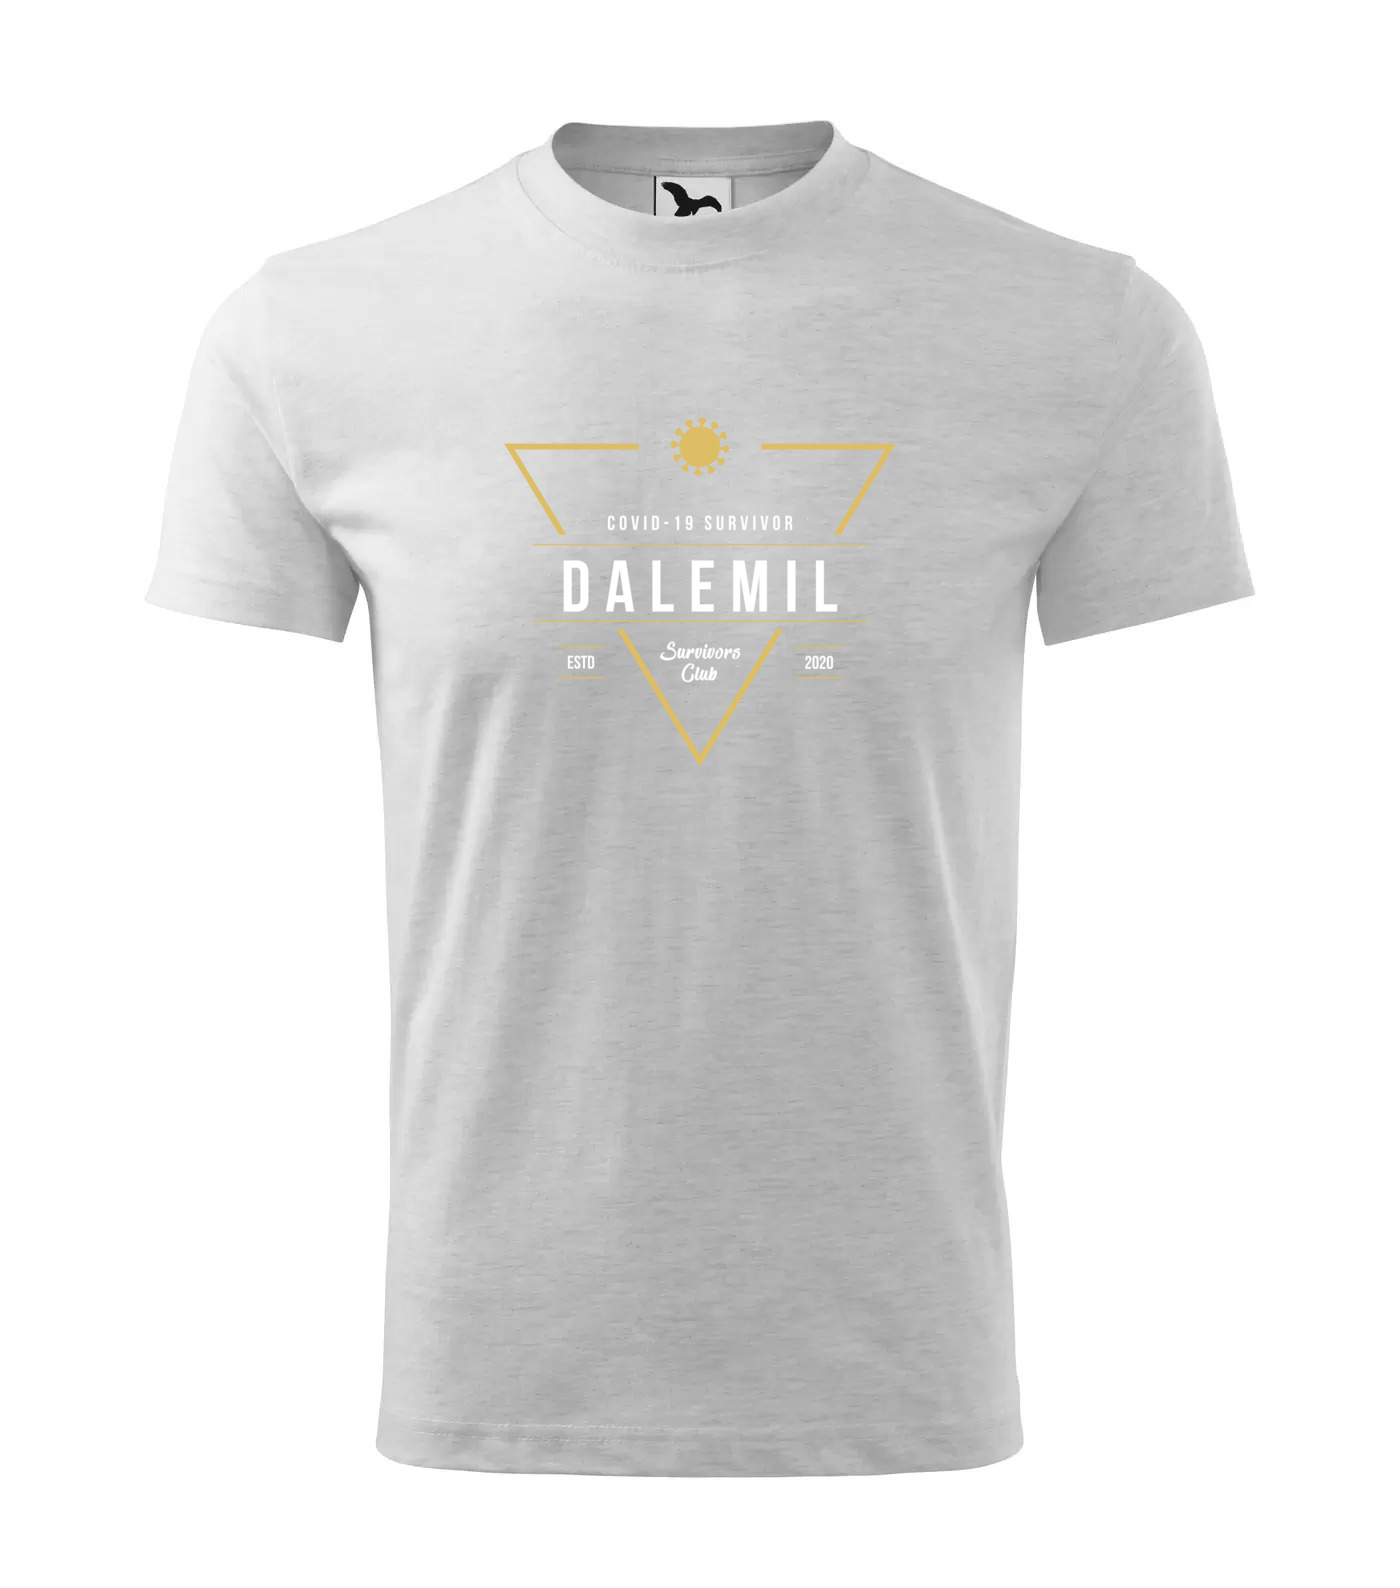 Tričko Survivor Club Dalemil